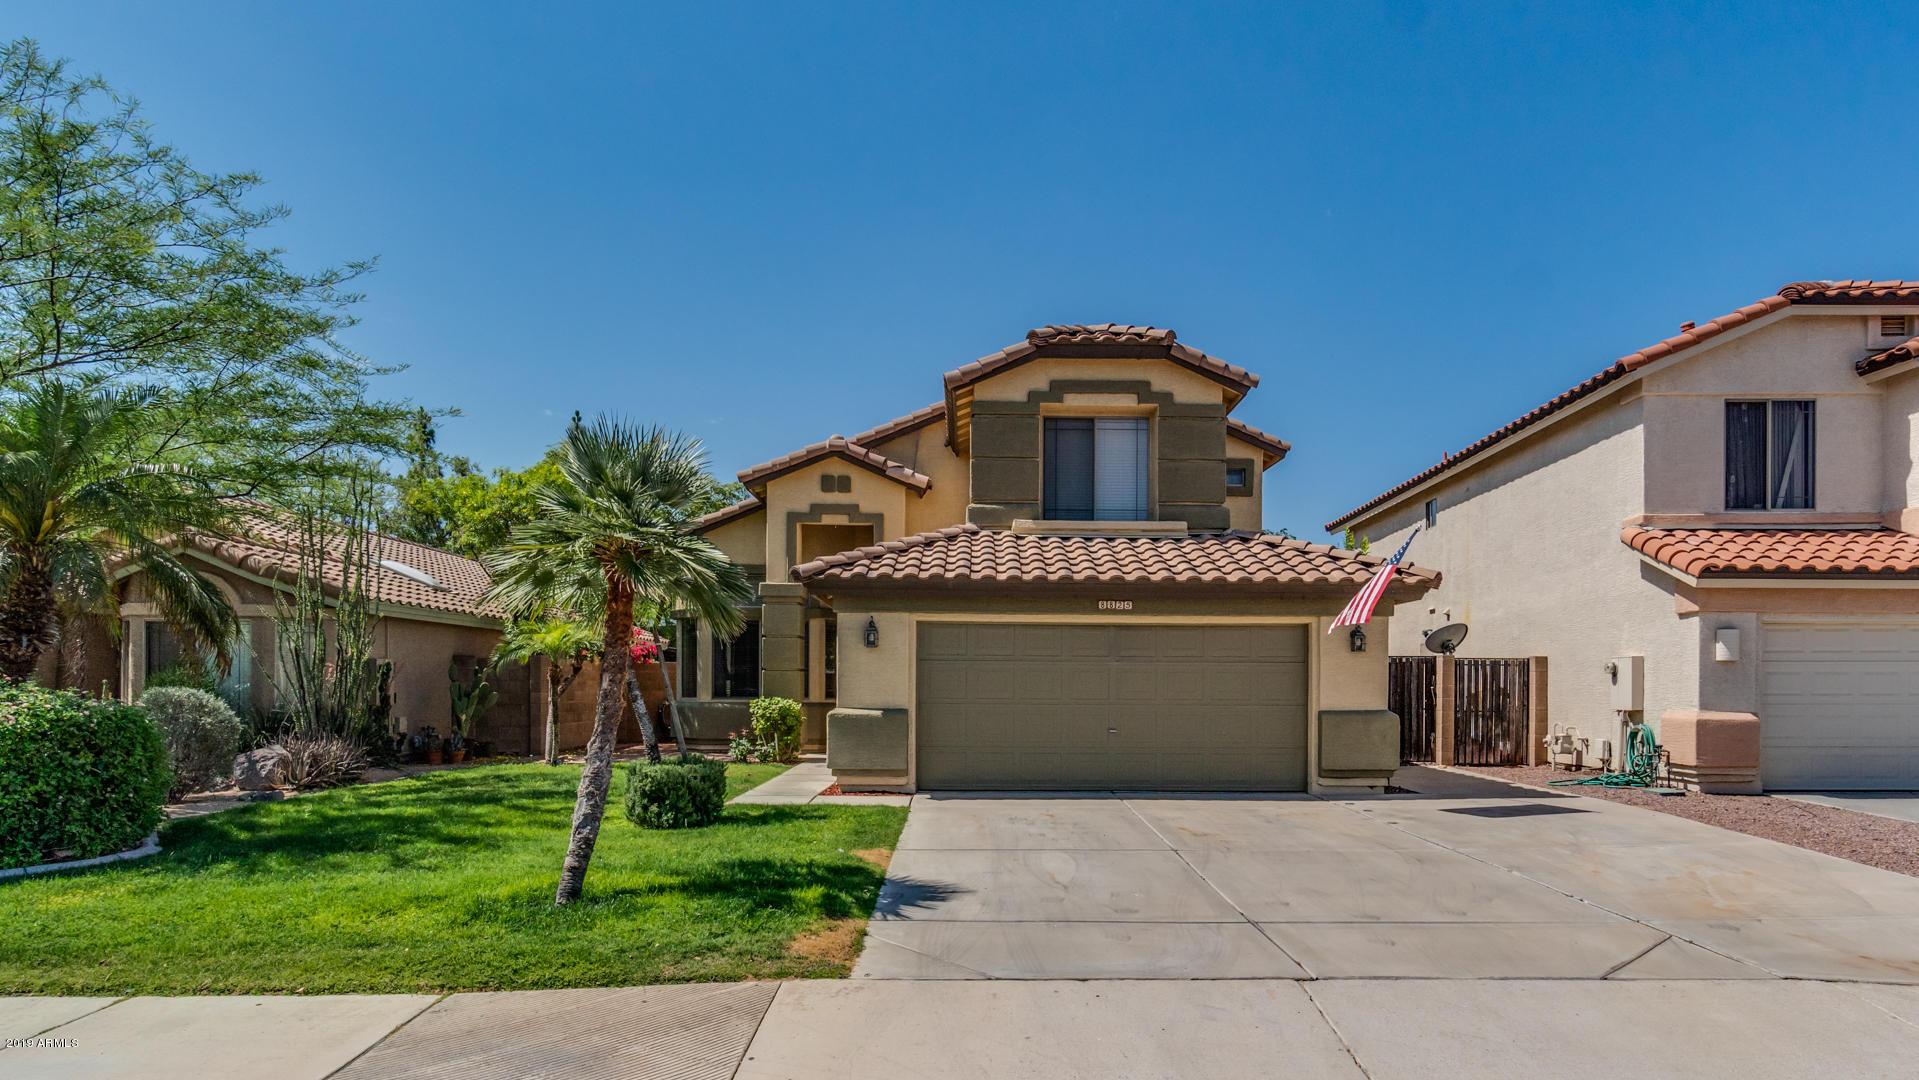 8825 W QUAIL Avenue, Peoria, Arizona